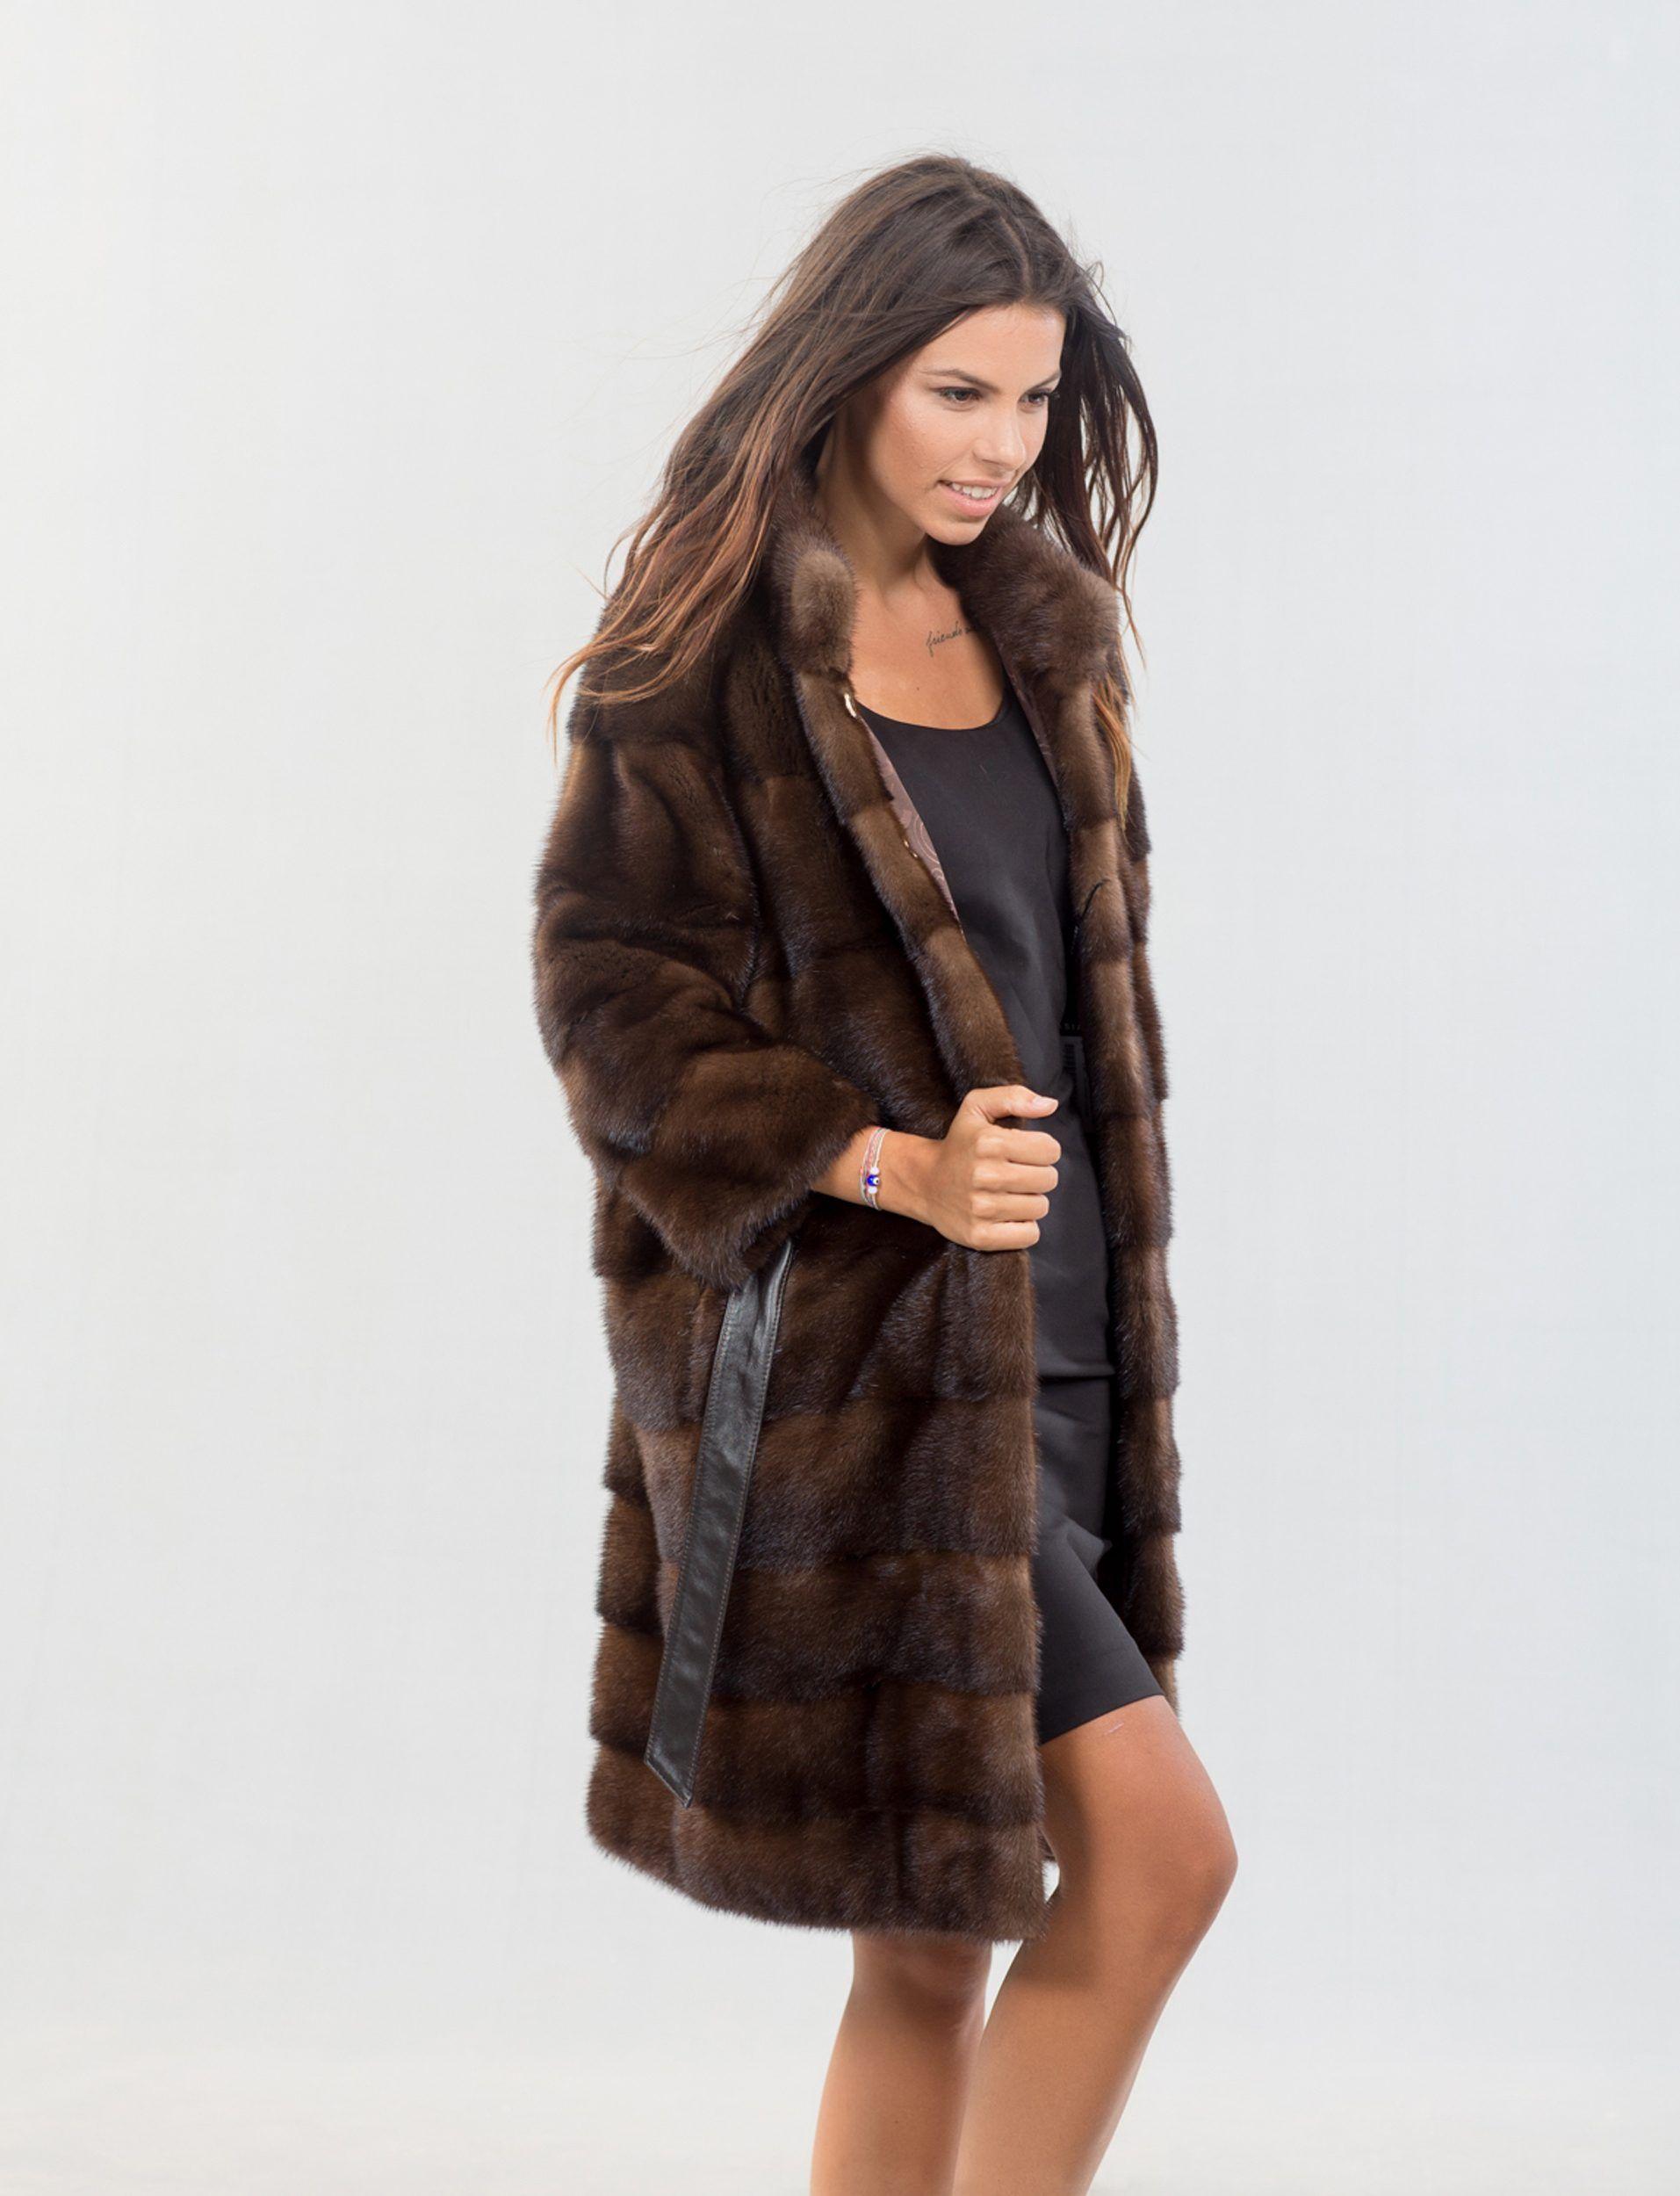 0e8d899130 Brown Mink Fur Coat With Belt #brown #mink #fur #jcoat #belt #real #style # realfur #elegant #haute #luxury #chic #outfit #women #classy #online #store